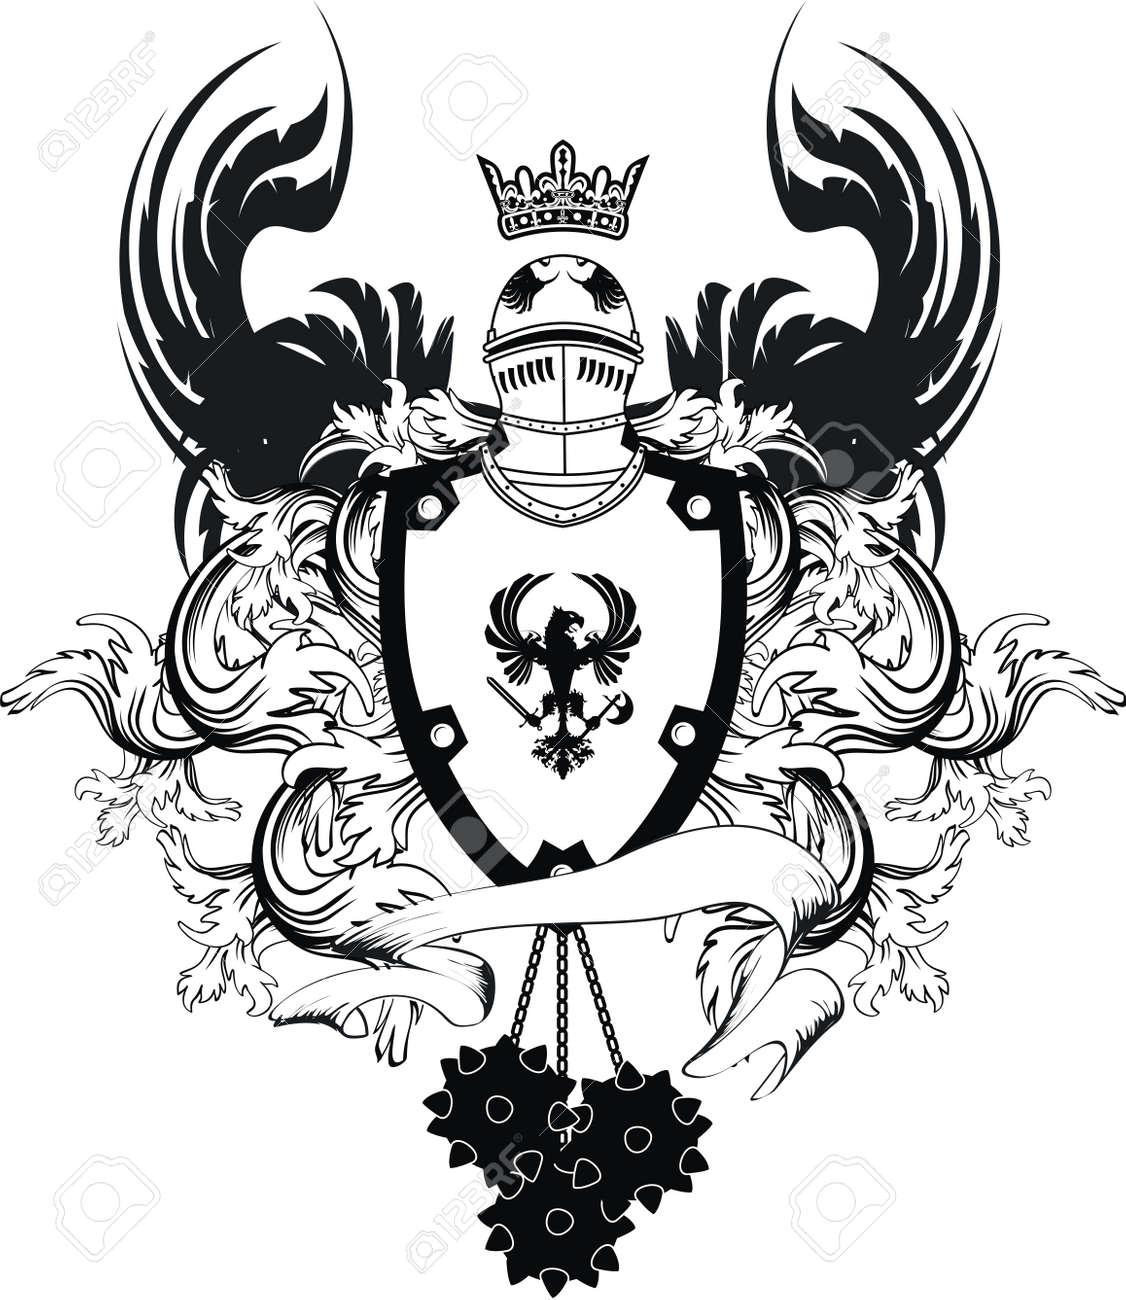 heraldic helmet coat of arms in vector format royalty free cliparts rh 123rf com coat of arms vector download coat of arms vector art